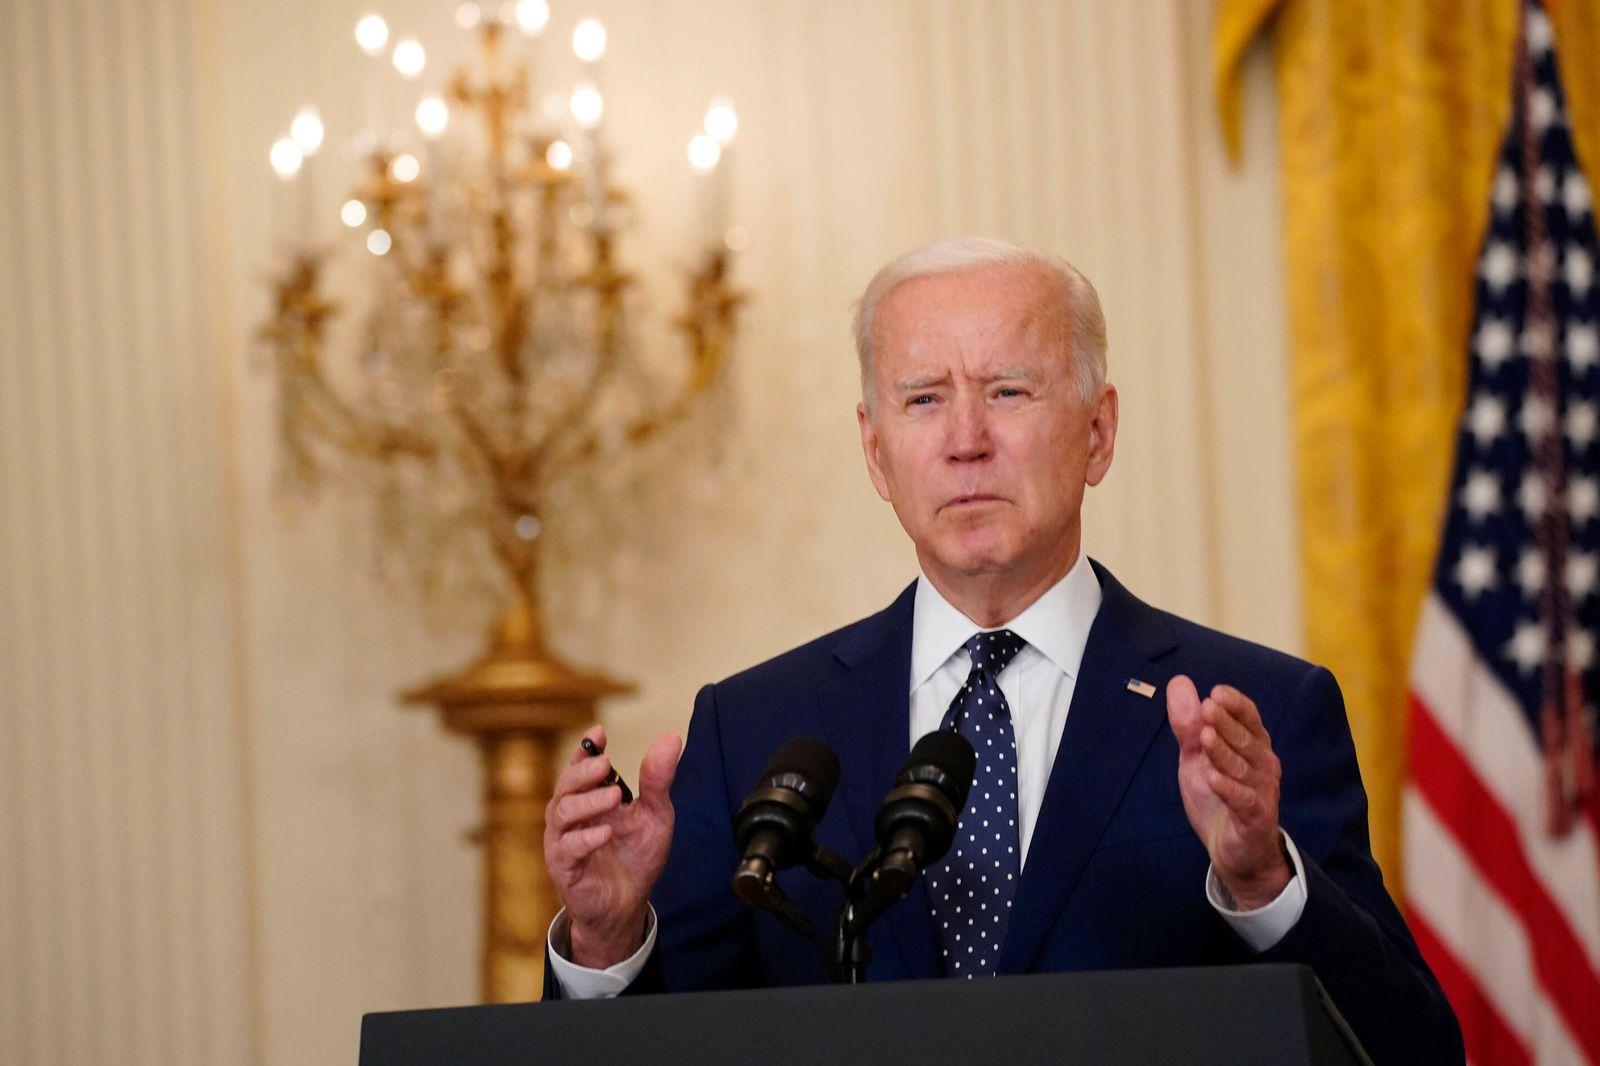 April 15, 2021, Washington, District of Columbia, USA: U.S. President Joe Biden speaks in the East Room of the White Ho